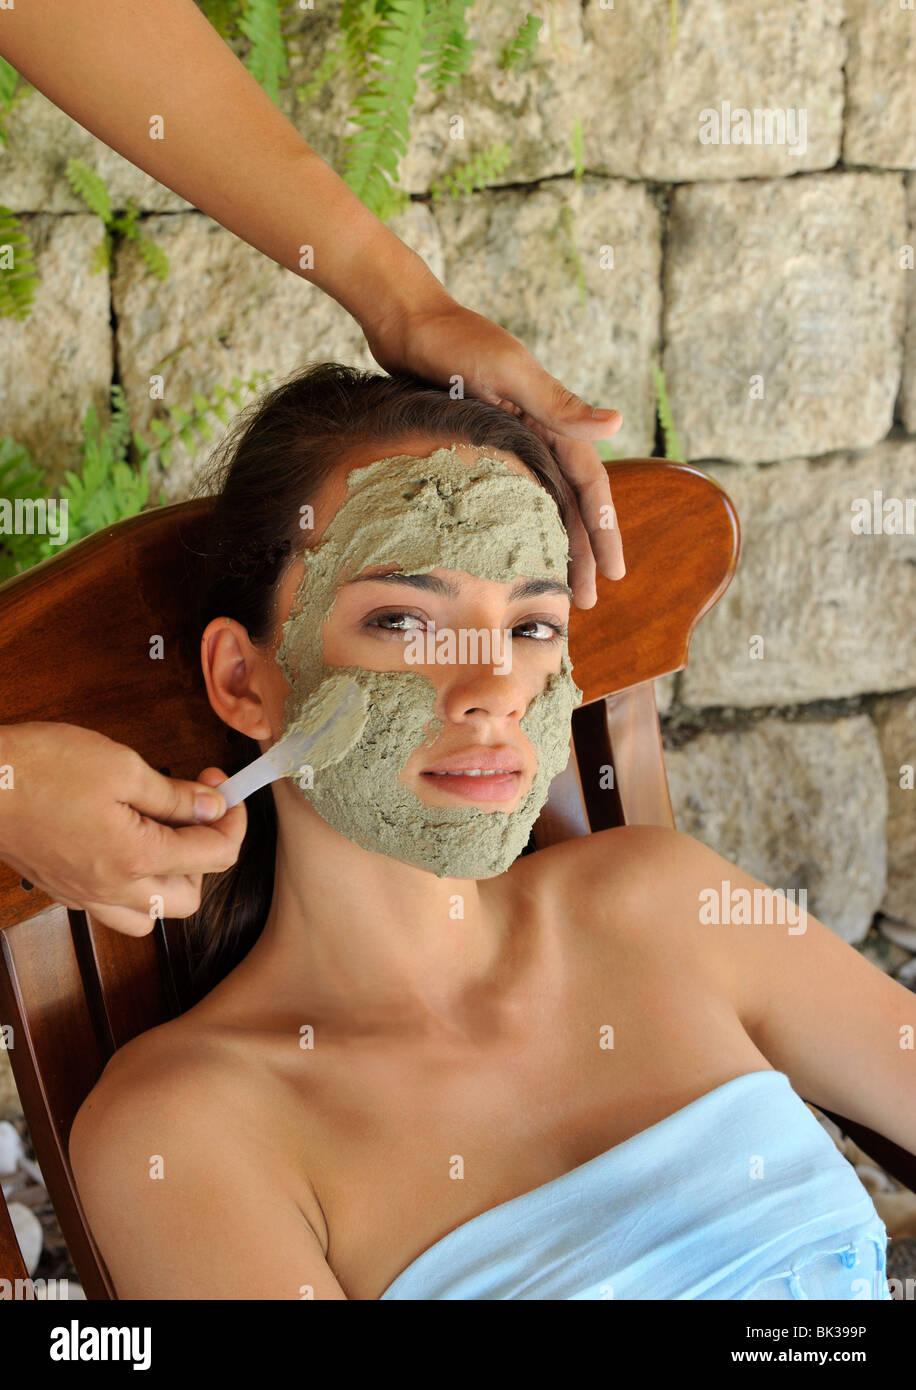 Phytomer marine mud facial, Mogambo Spa, Cebu, Philippines, Southeast Asia, Asia - Stock Image